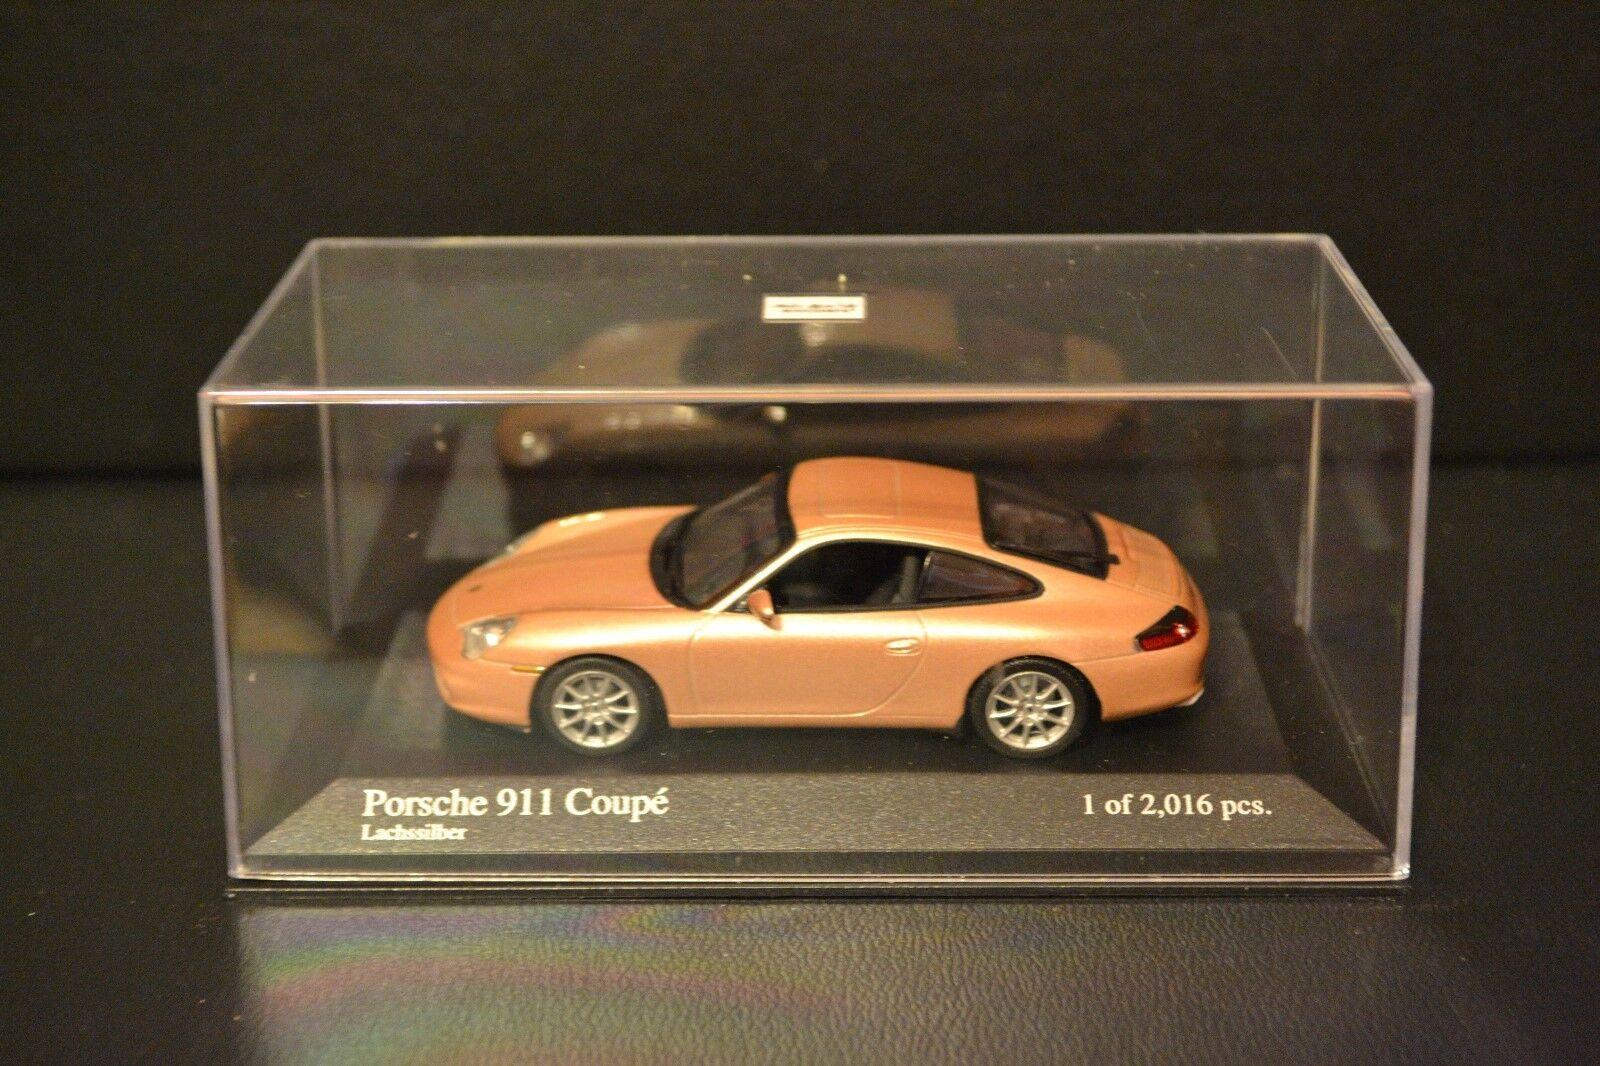 Porsche 911 (996) Coupe 2001 Minichamps tärningskast fordon i skala 1  43